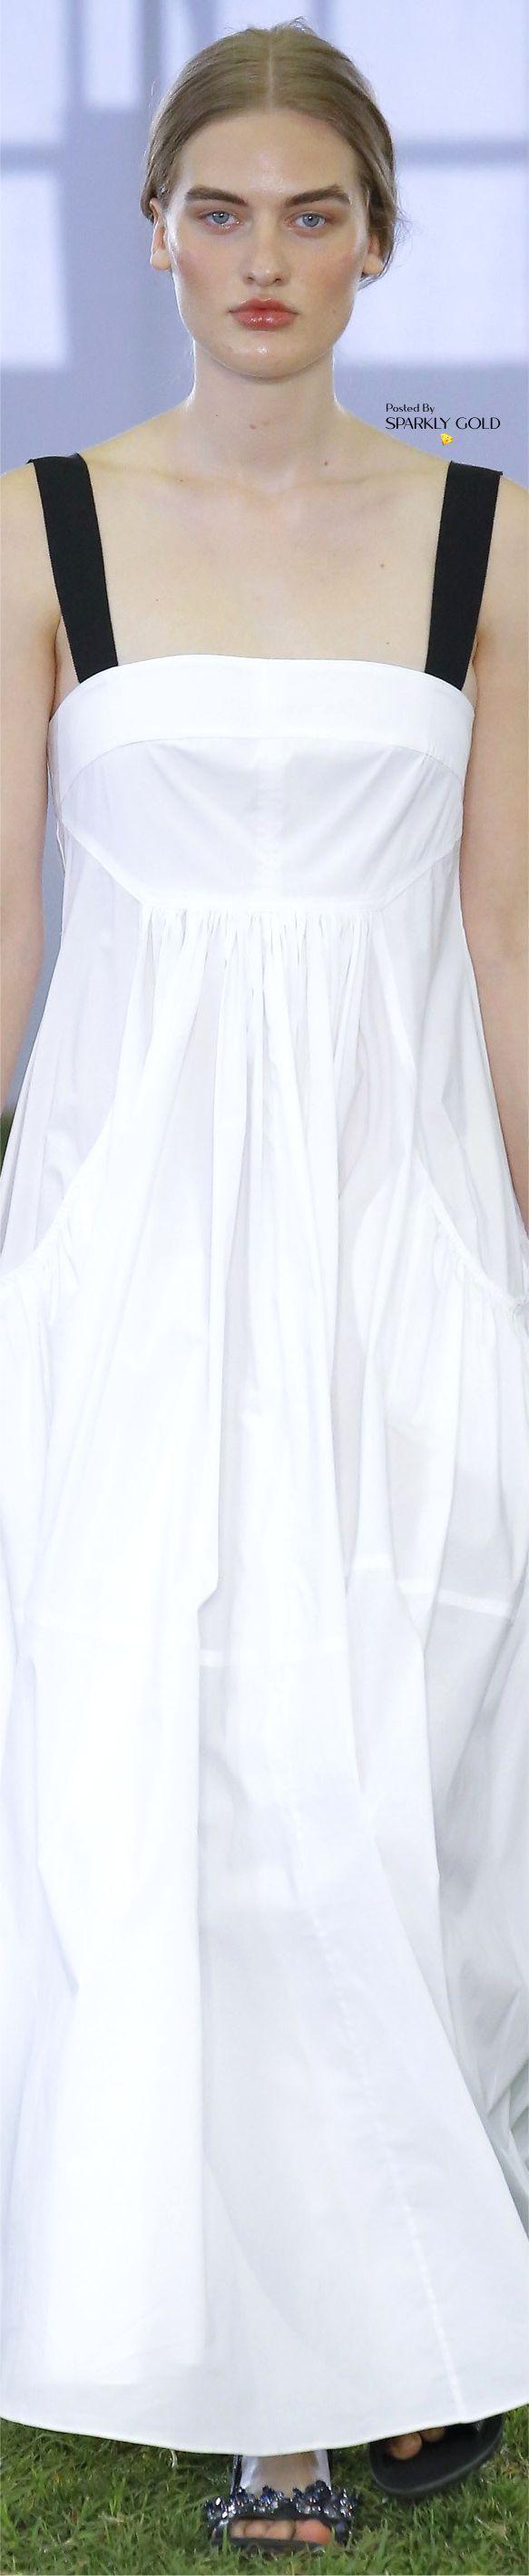 Lace dress in black august 2019 Lee Mathews Resort  Australia  Лето  Pinterest  Resorts